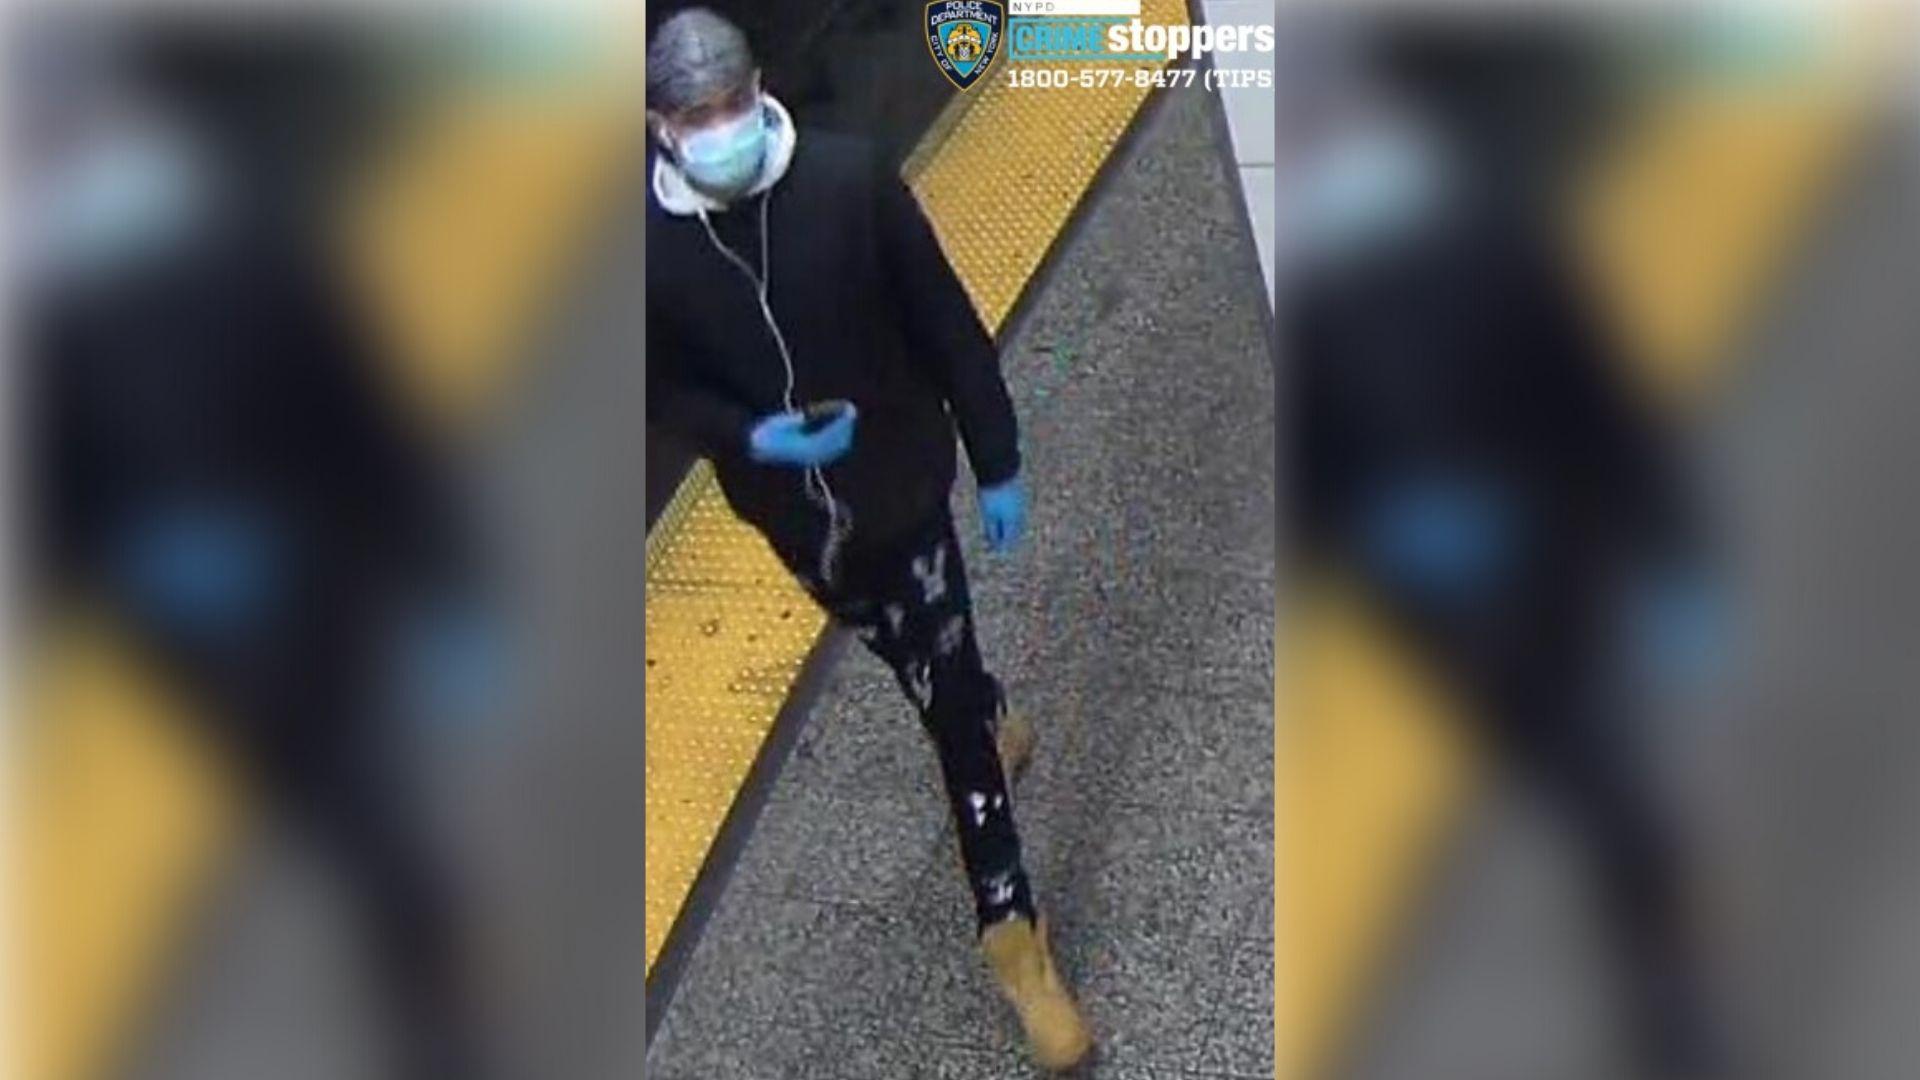 Cab driver spat on, slashed in Manhattan